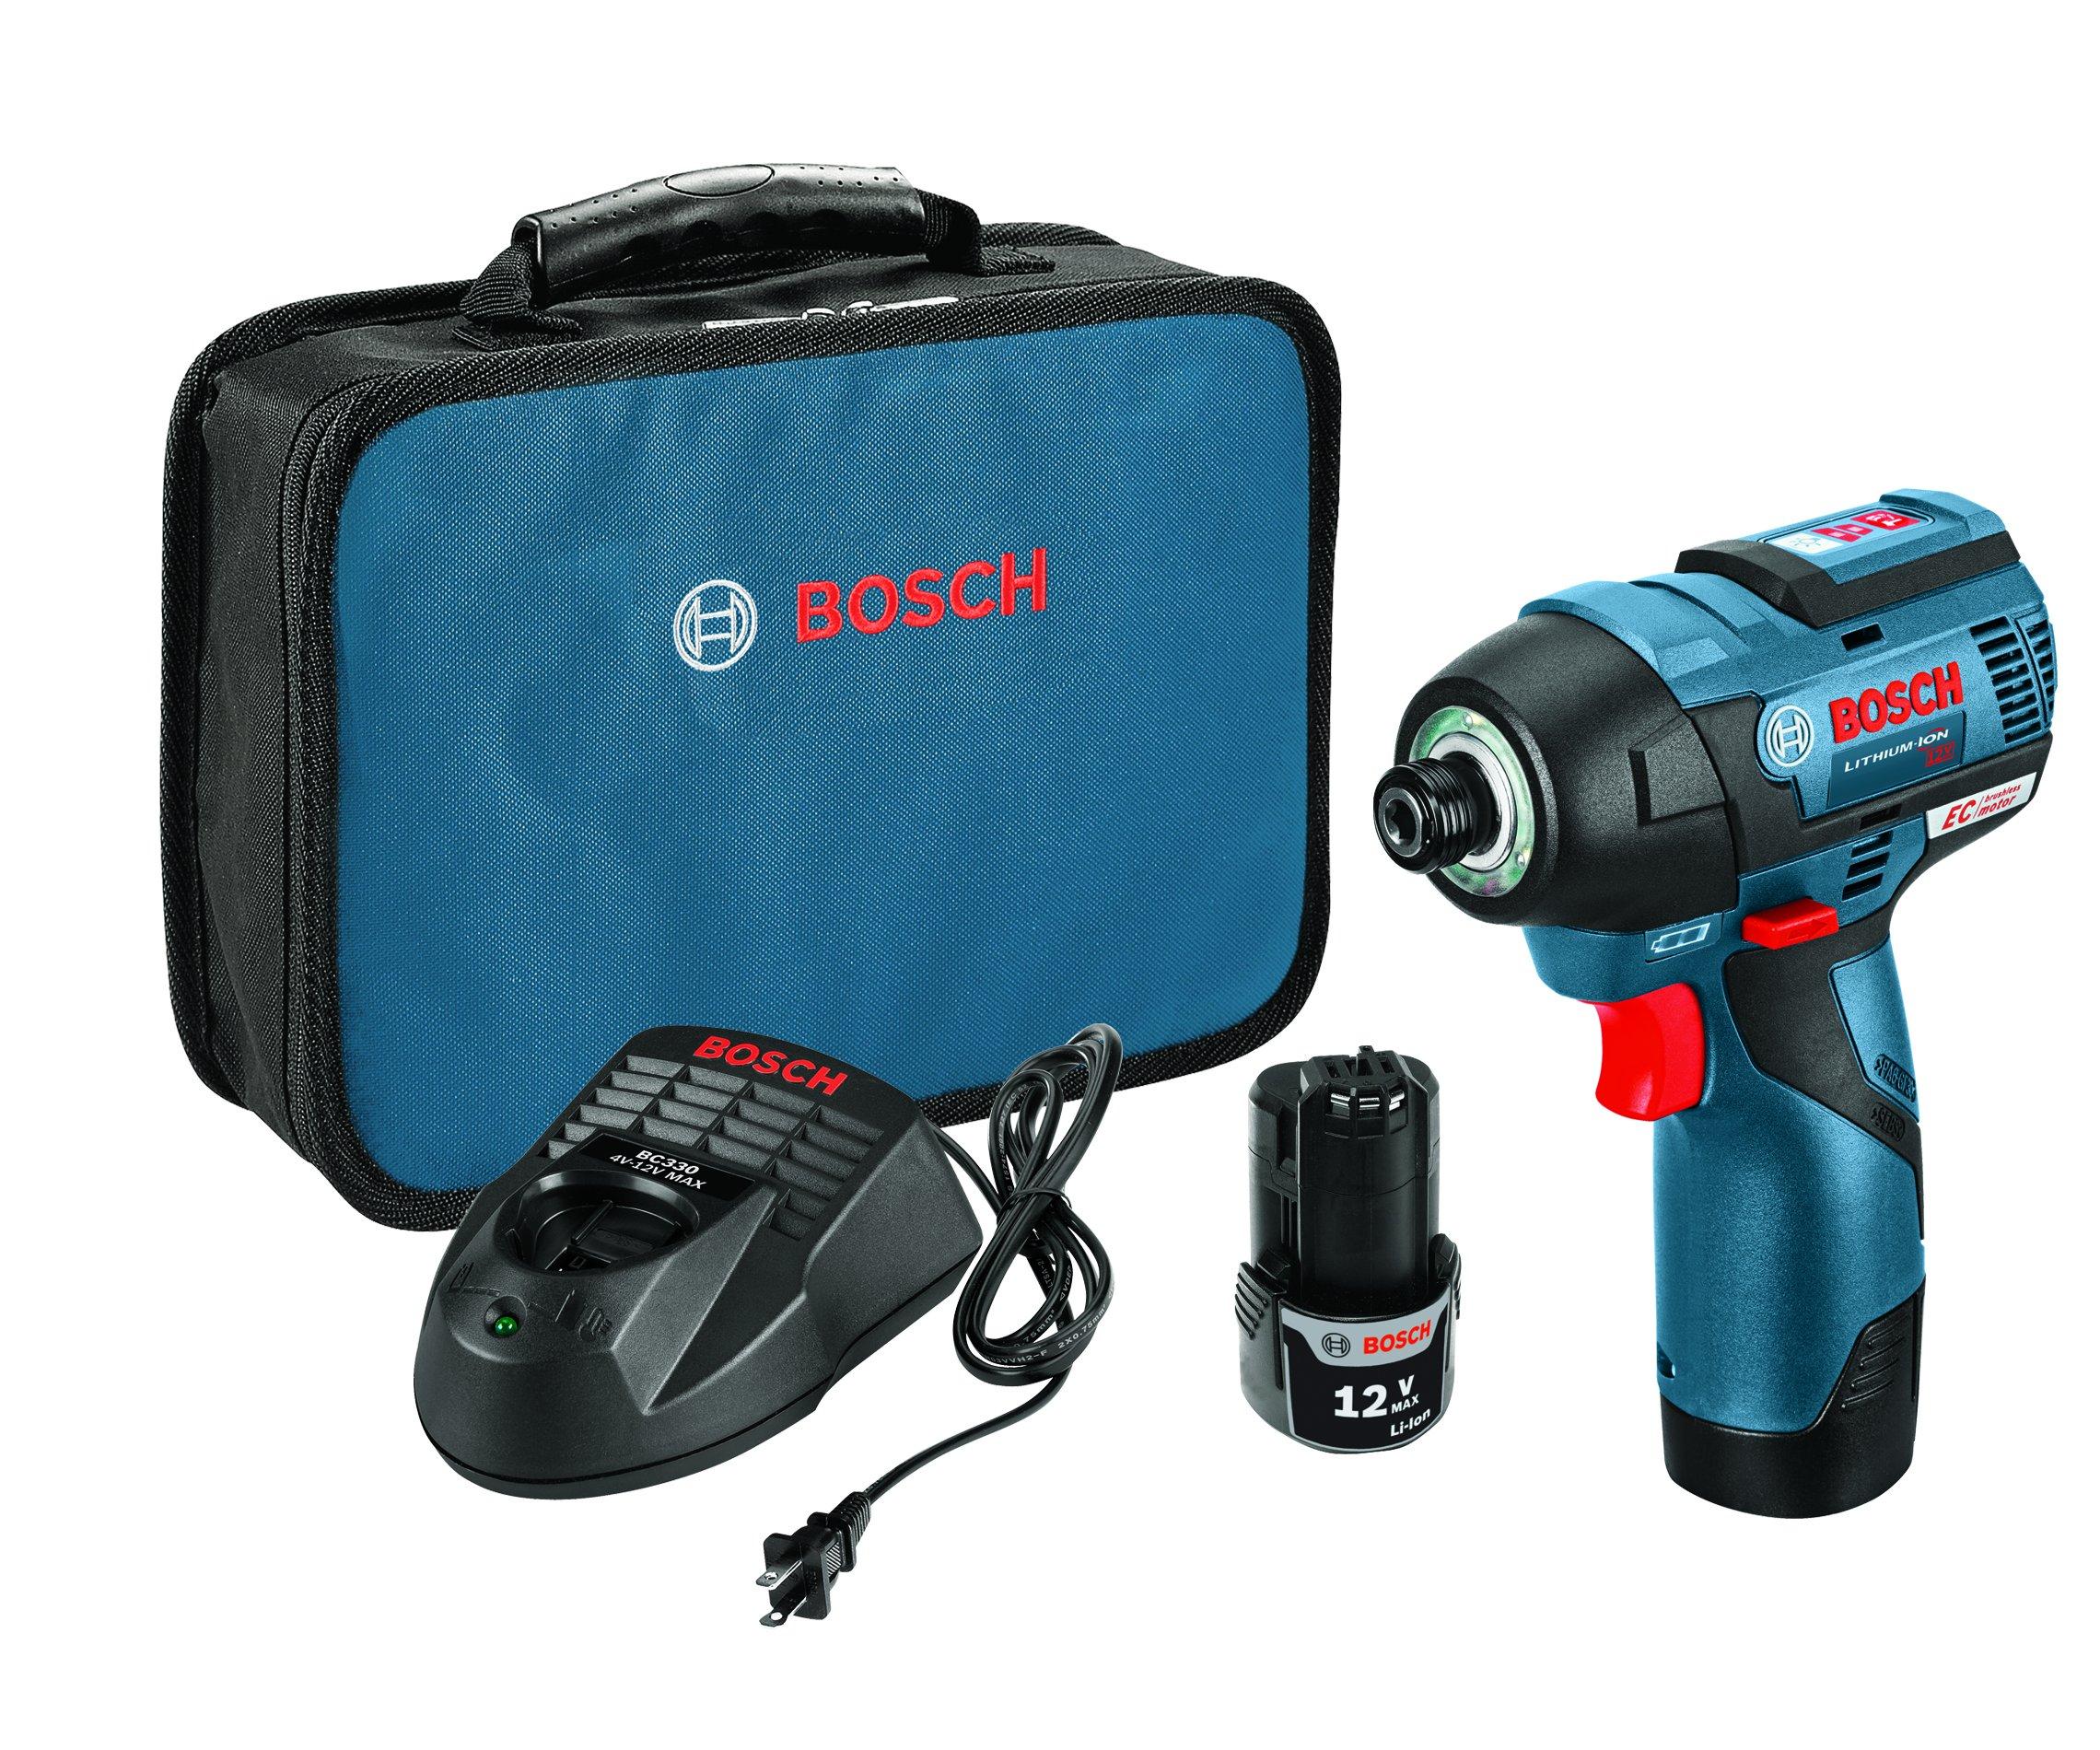 Bosch PS42-02 12V Max EC Brushless Impact Driver Kit